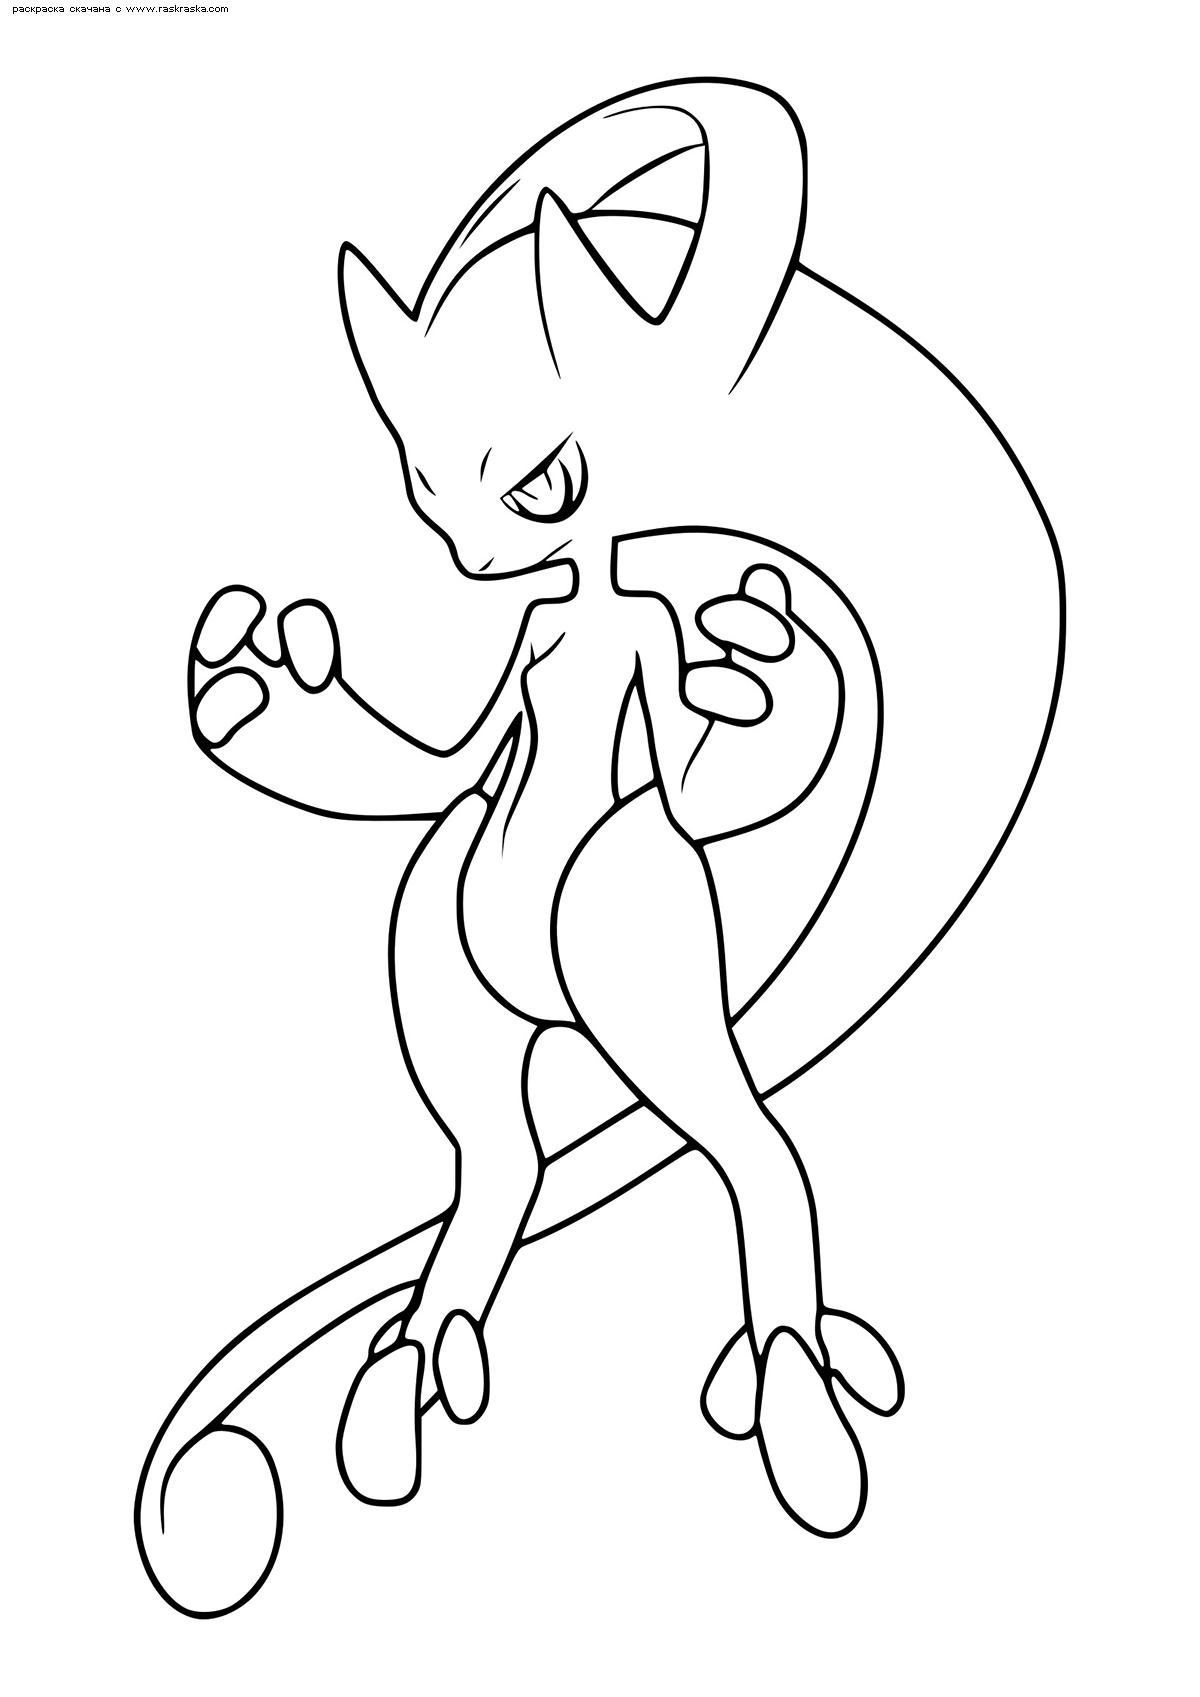 Раскраска Покемон Мега Мьюту X (Mega Mewtwo X) . Раскраска Покемон